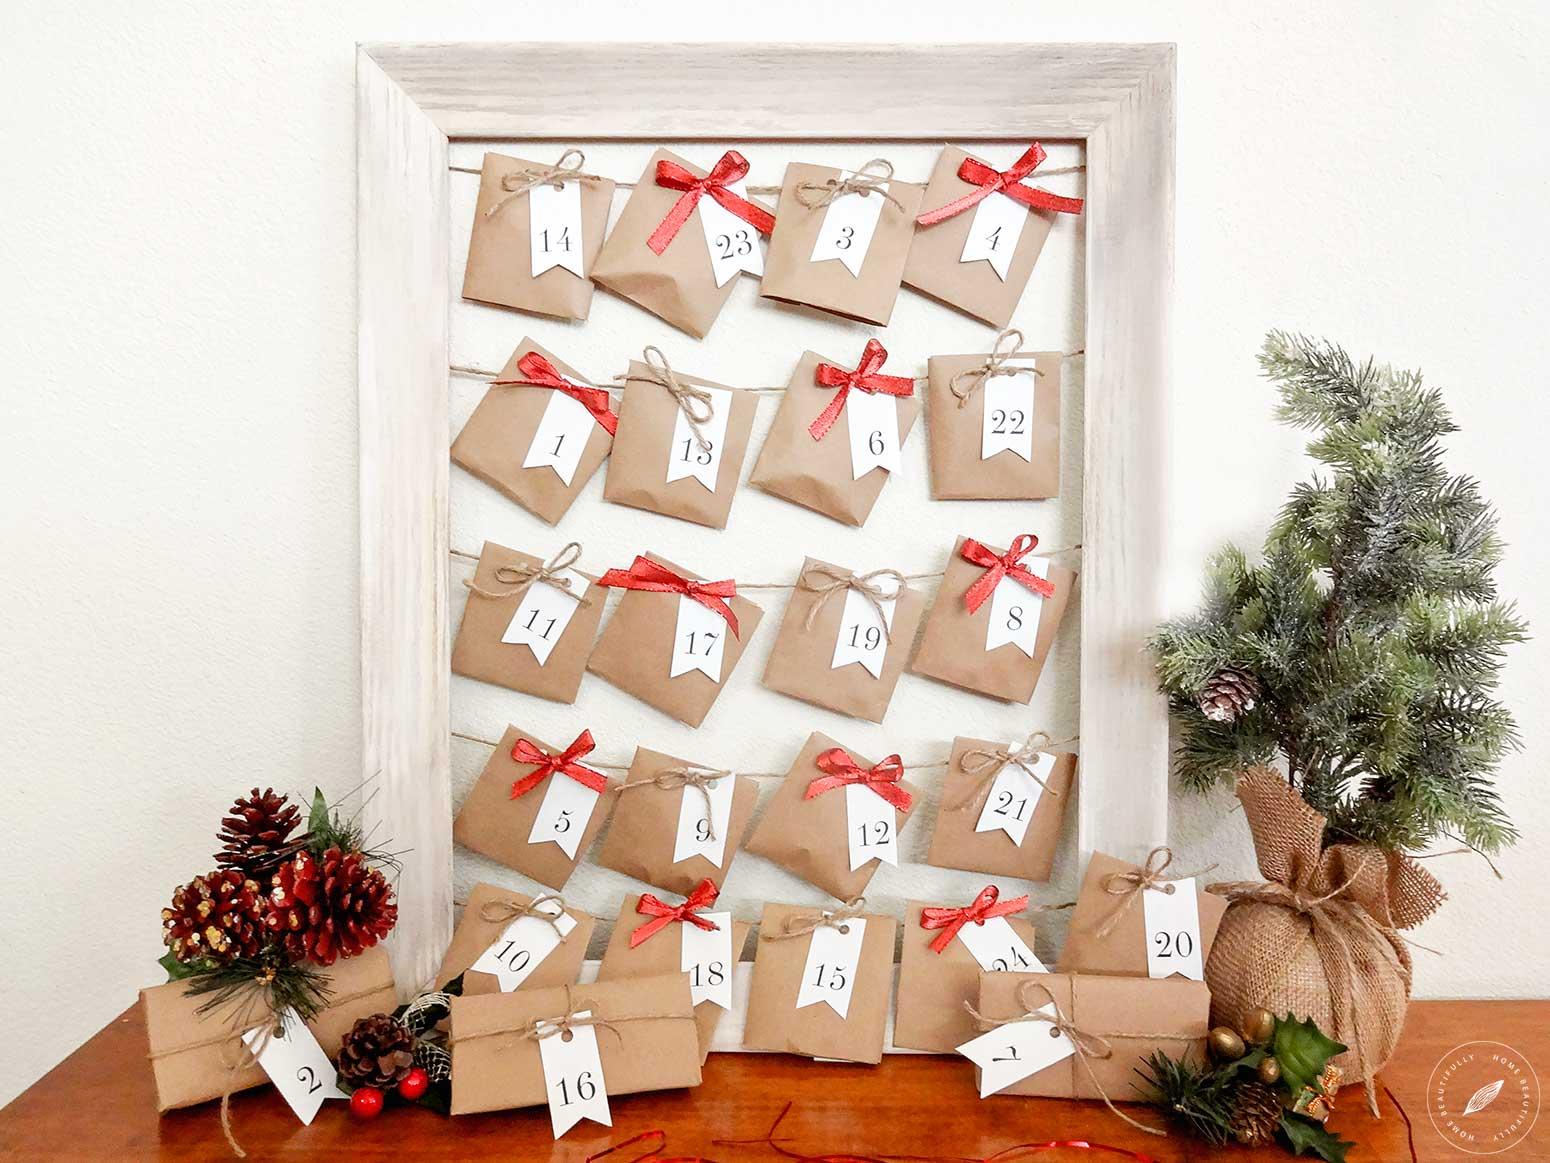 Create this beautiful DIY advent calendar!